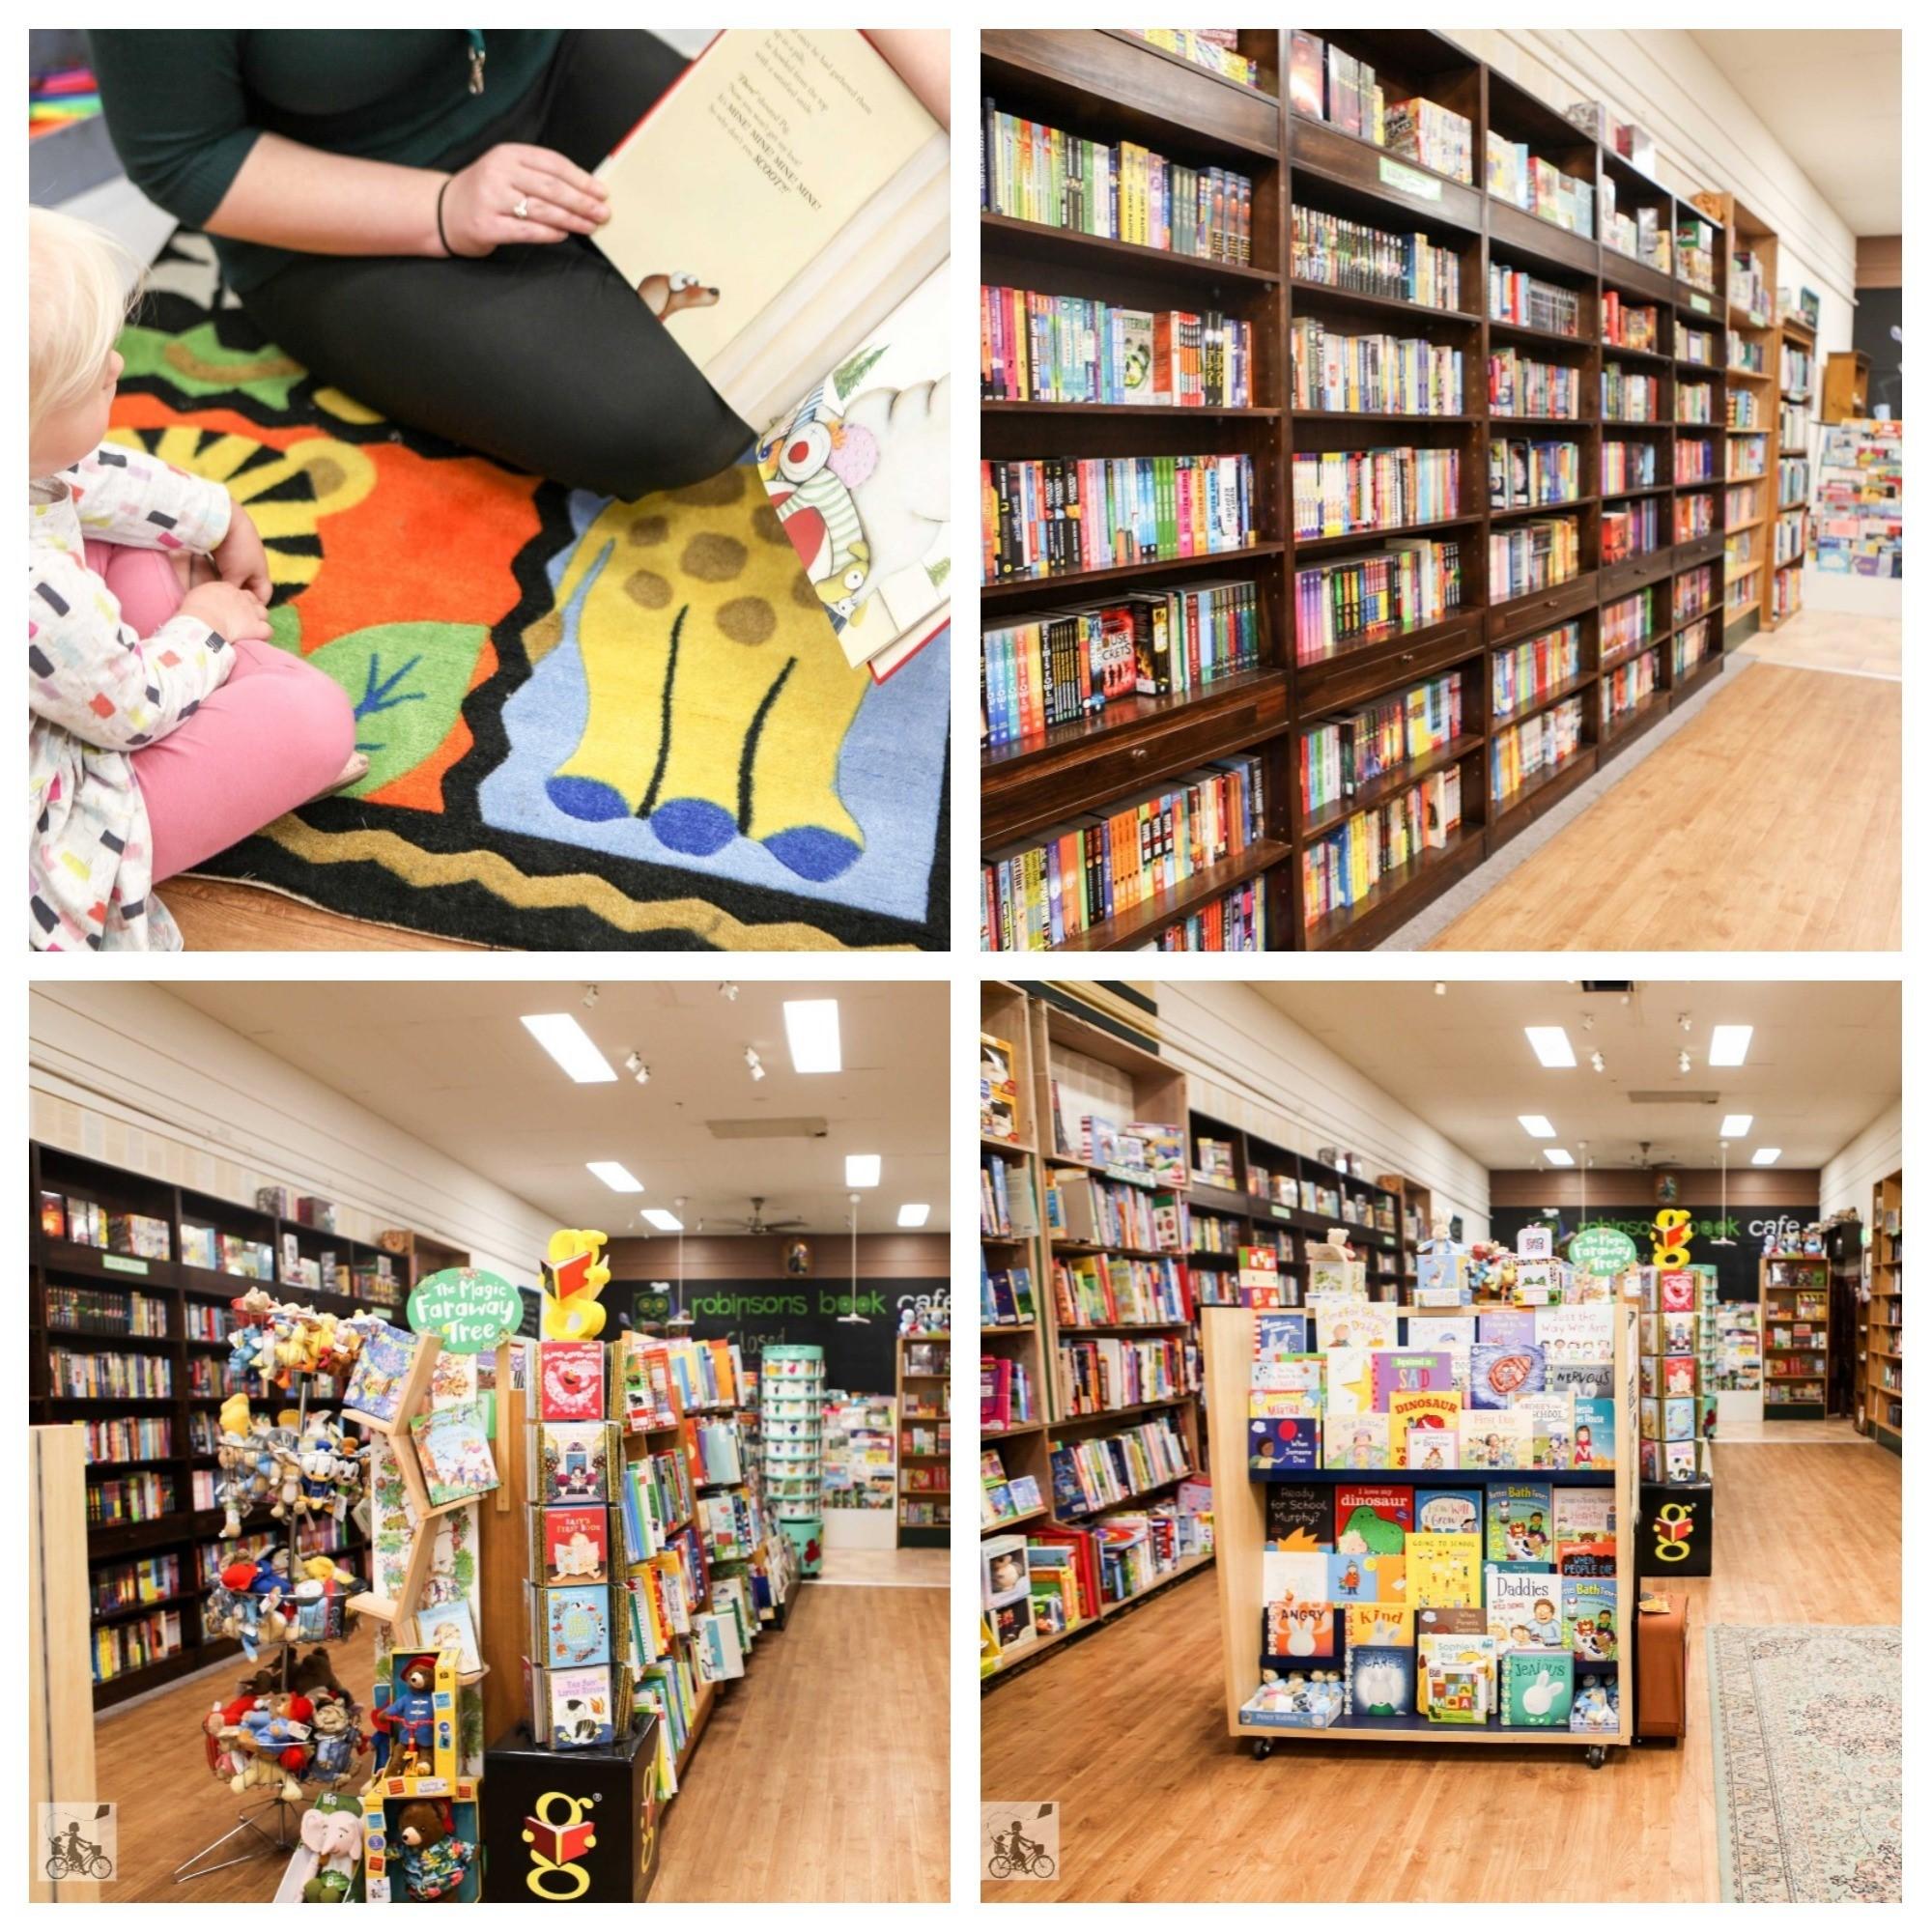 mamma knows south - story time @robinsons bookshop, frankston